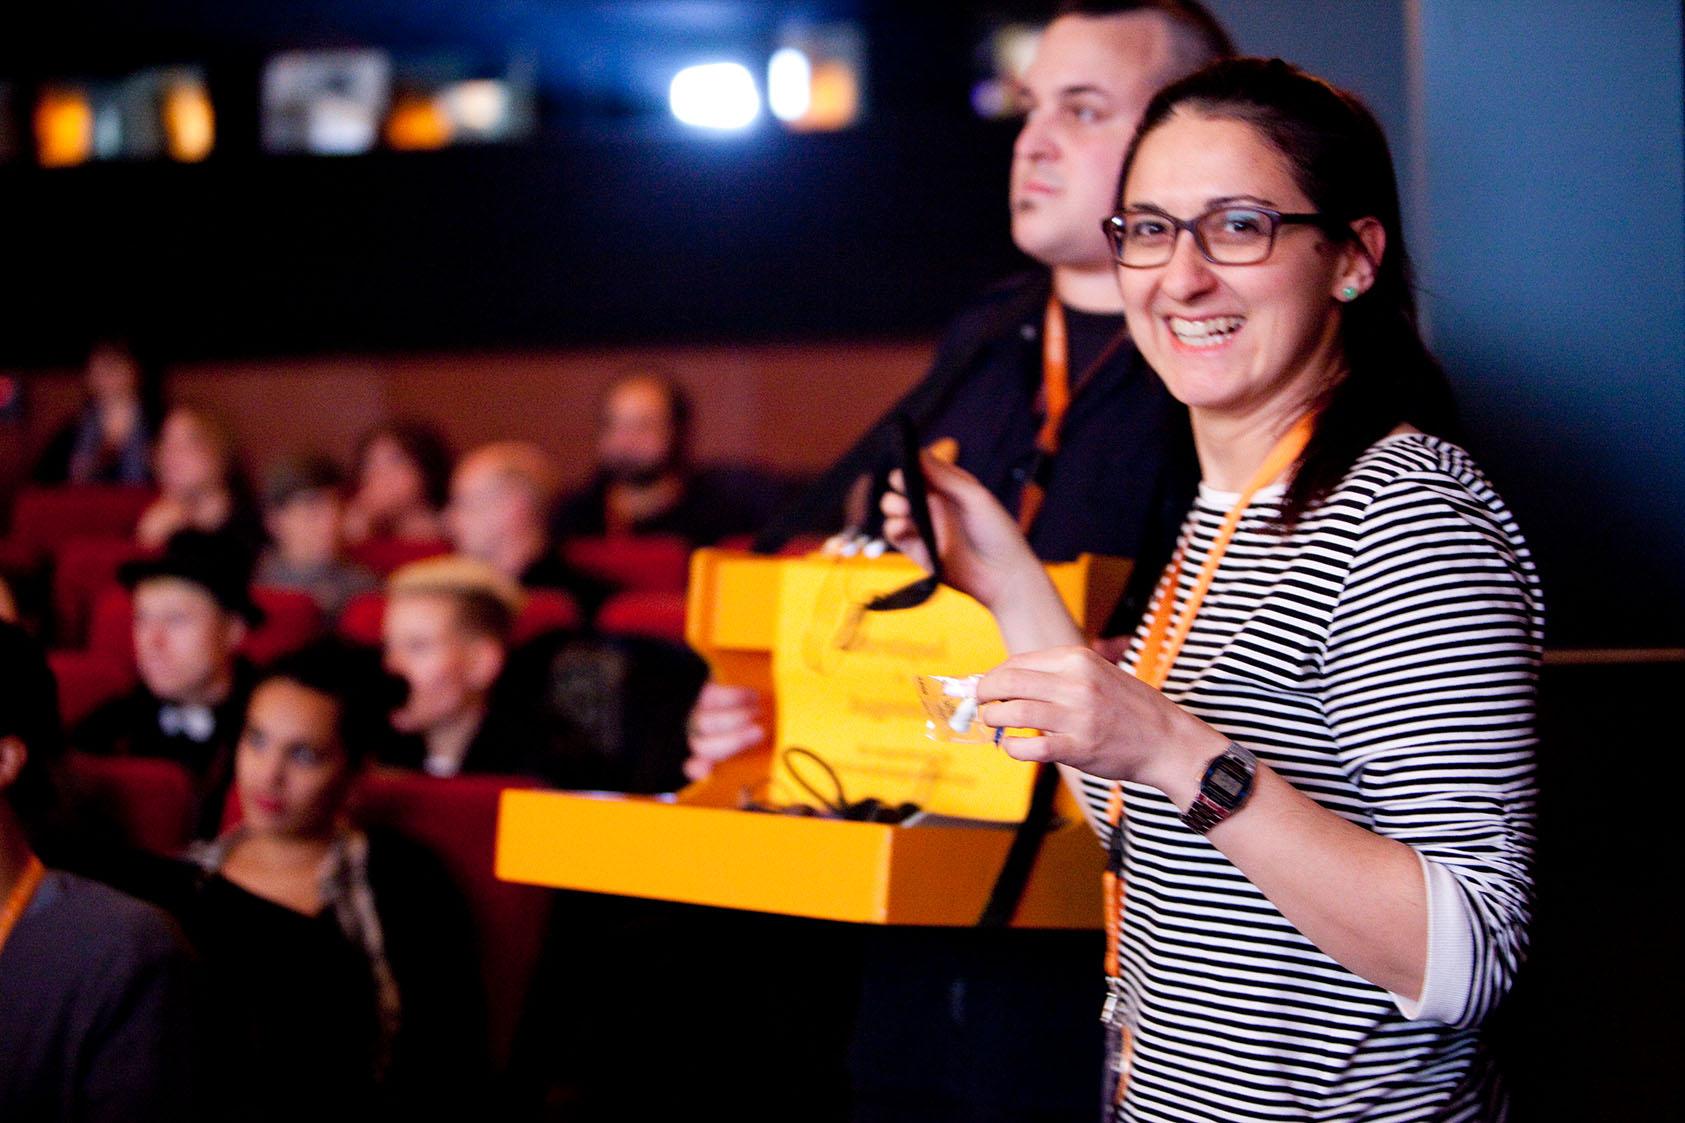 Kurzfilmfestival Klappe Auf